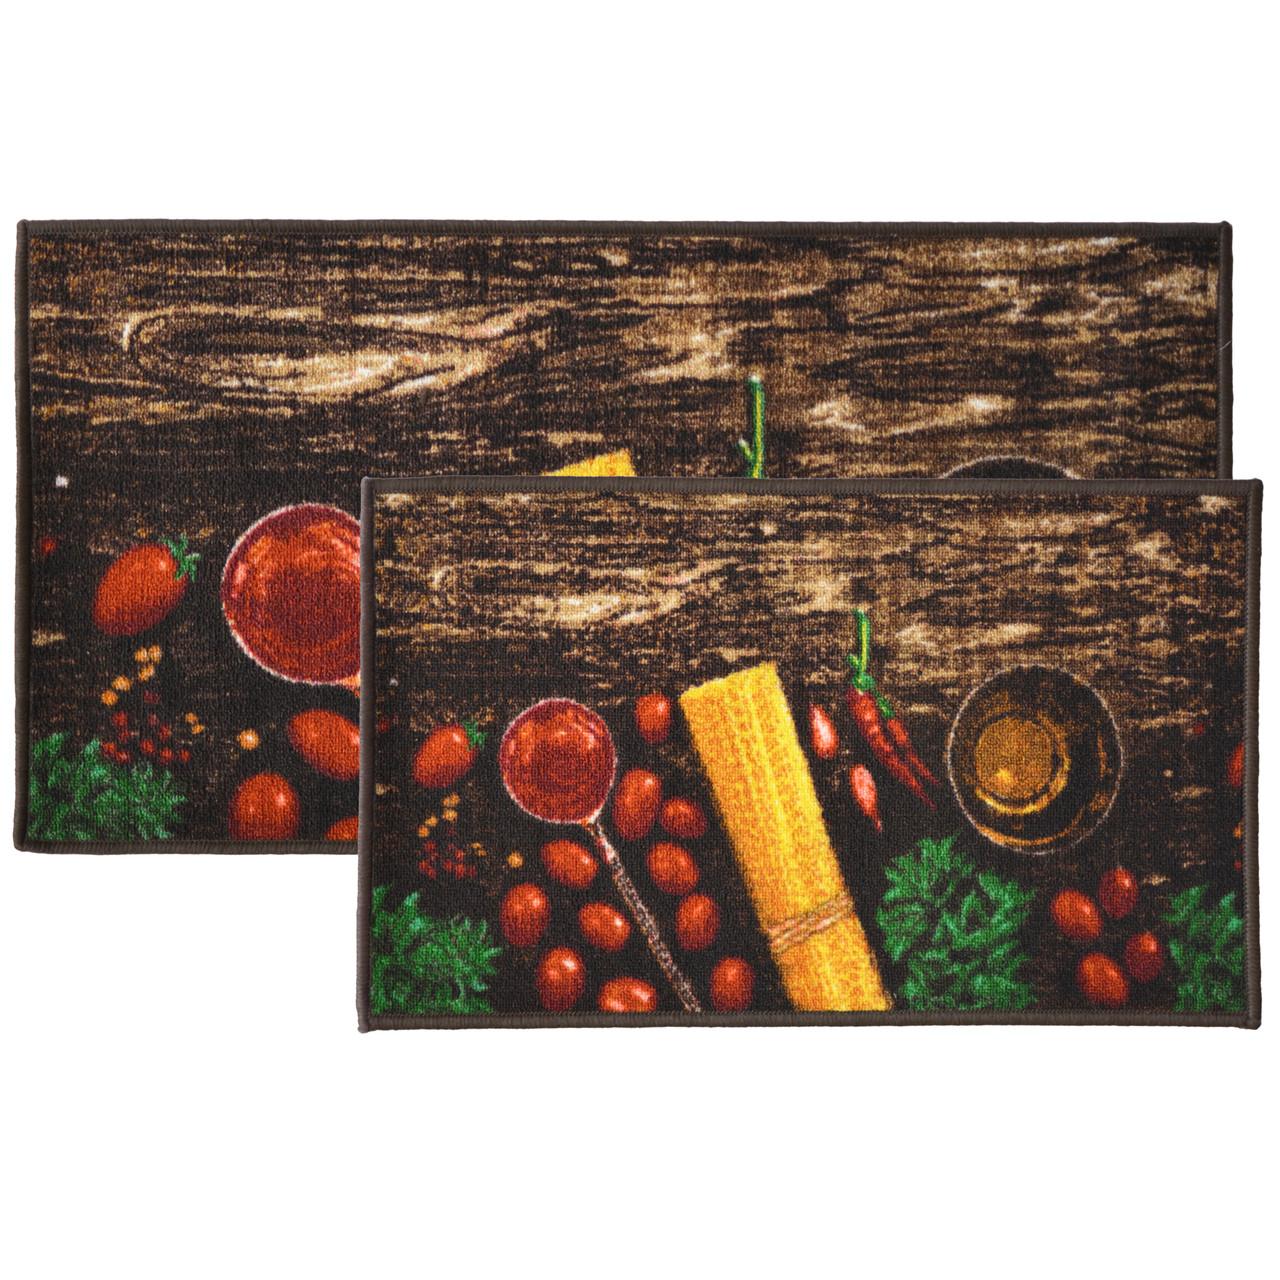 2pc Pasta Kitchen Rug Set, Area Rug, Mat, Carpet, Non-Skid Latex Back  (18x30 Rectangle & 20x40)